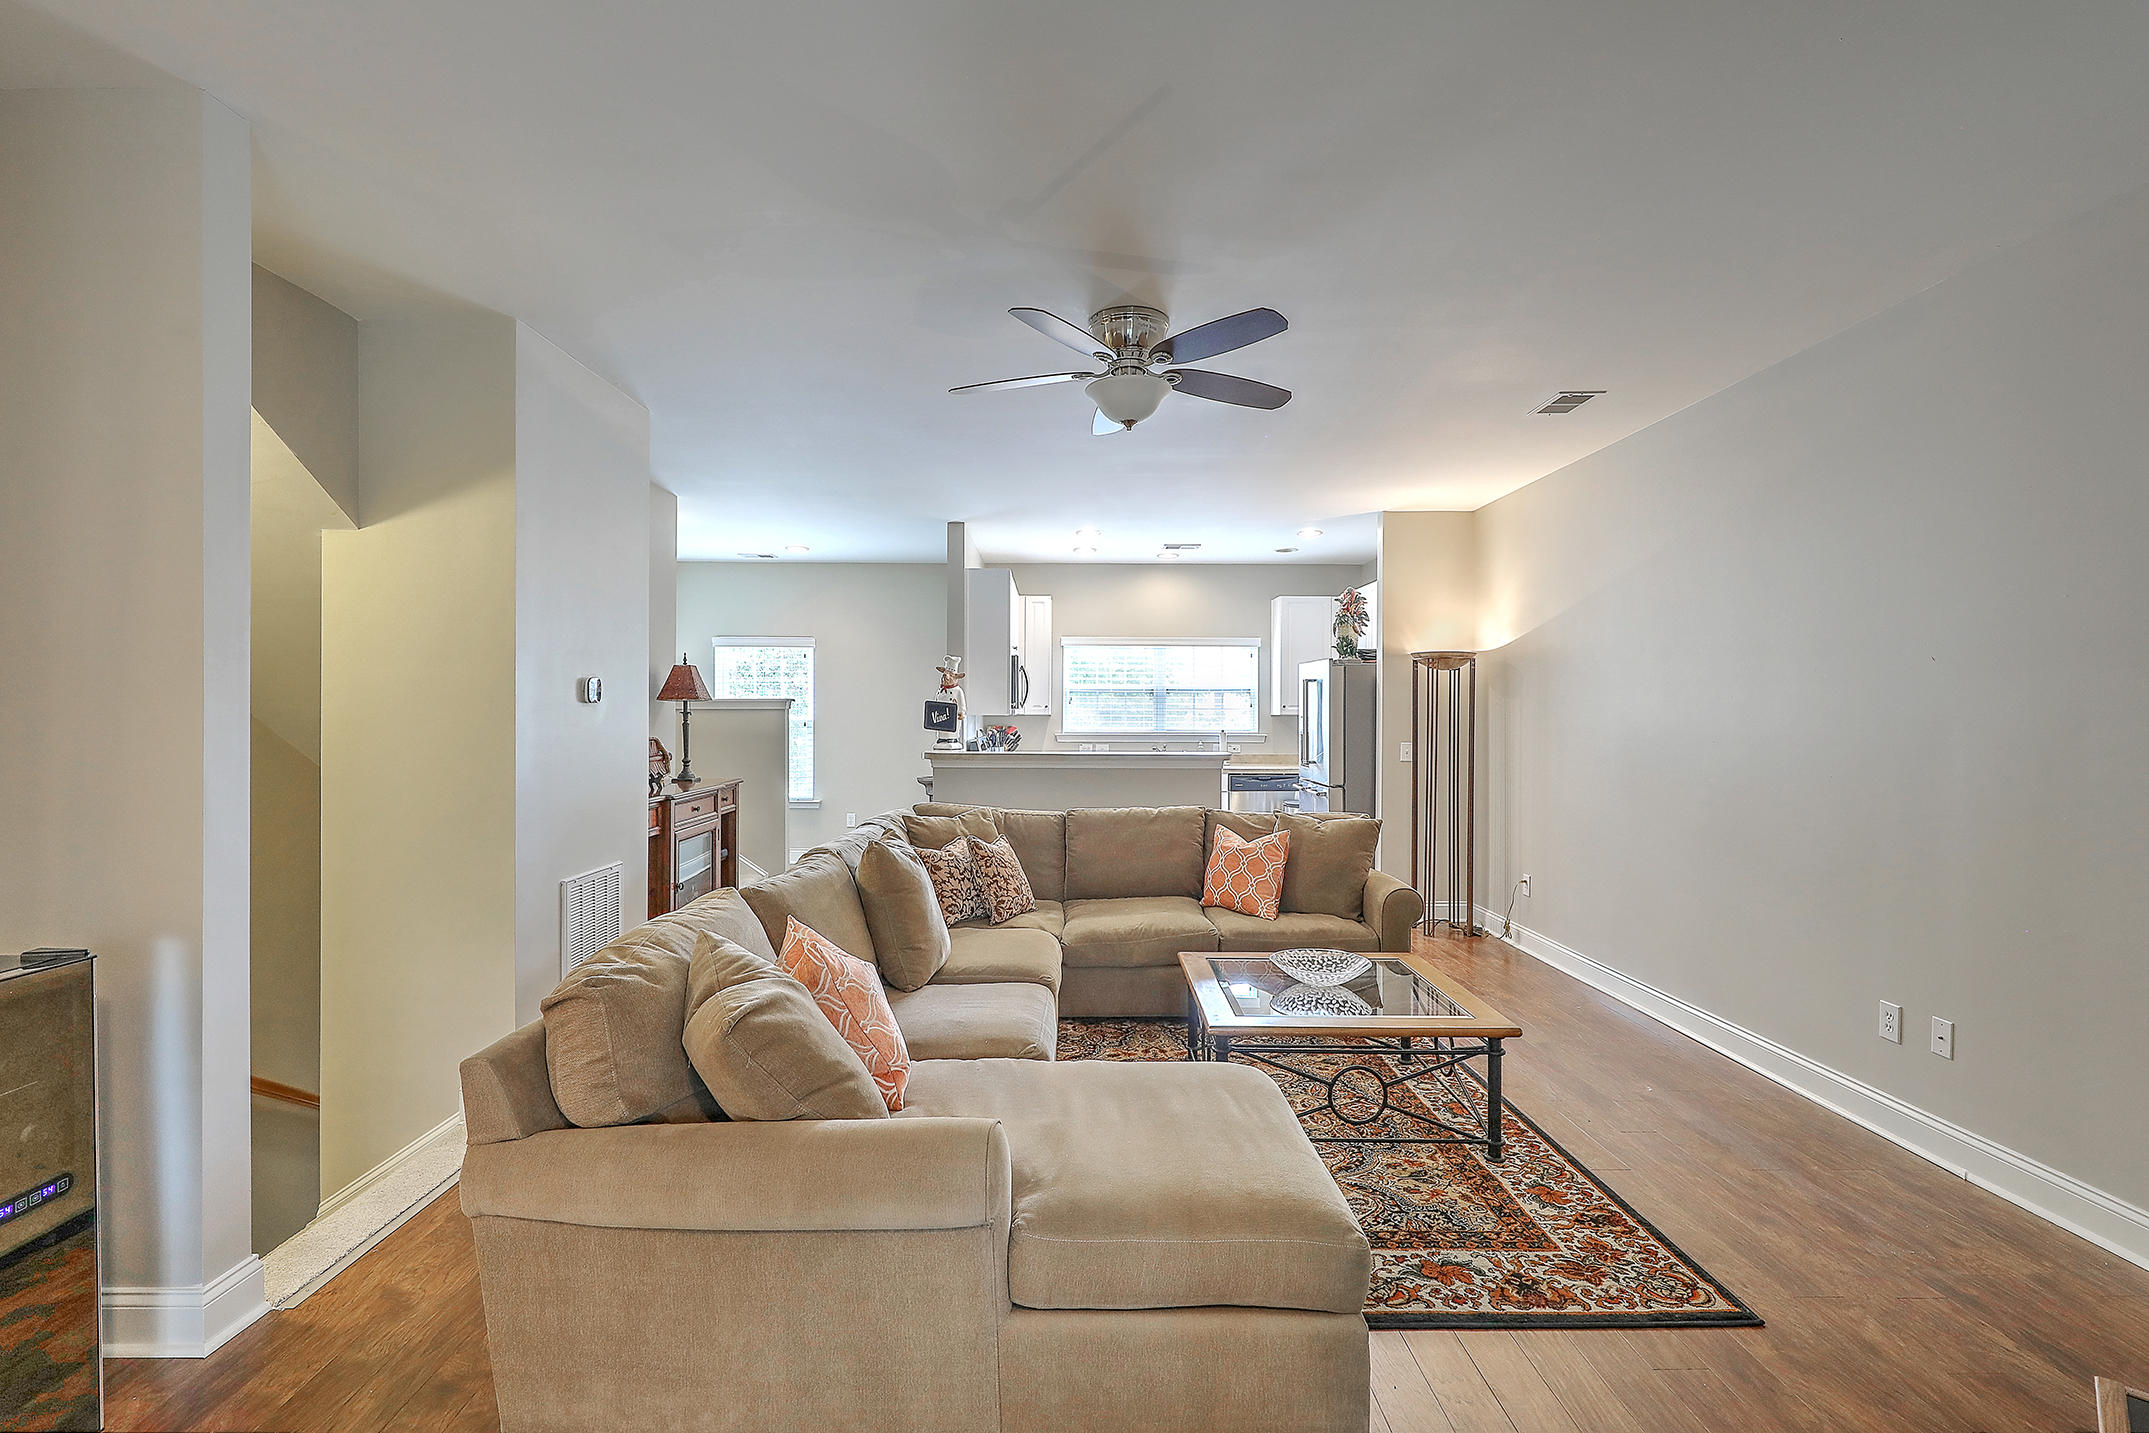 Ashley Park Homes For Sale - 4149 Perrine, Charleston, SC - 8